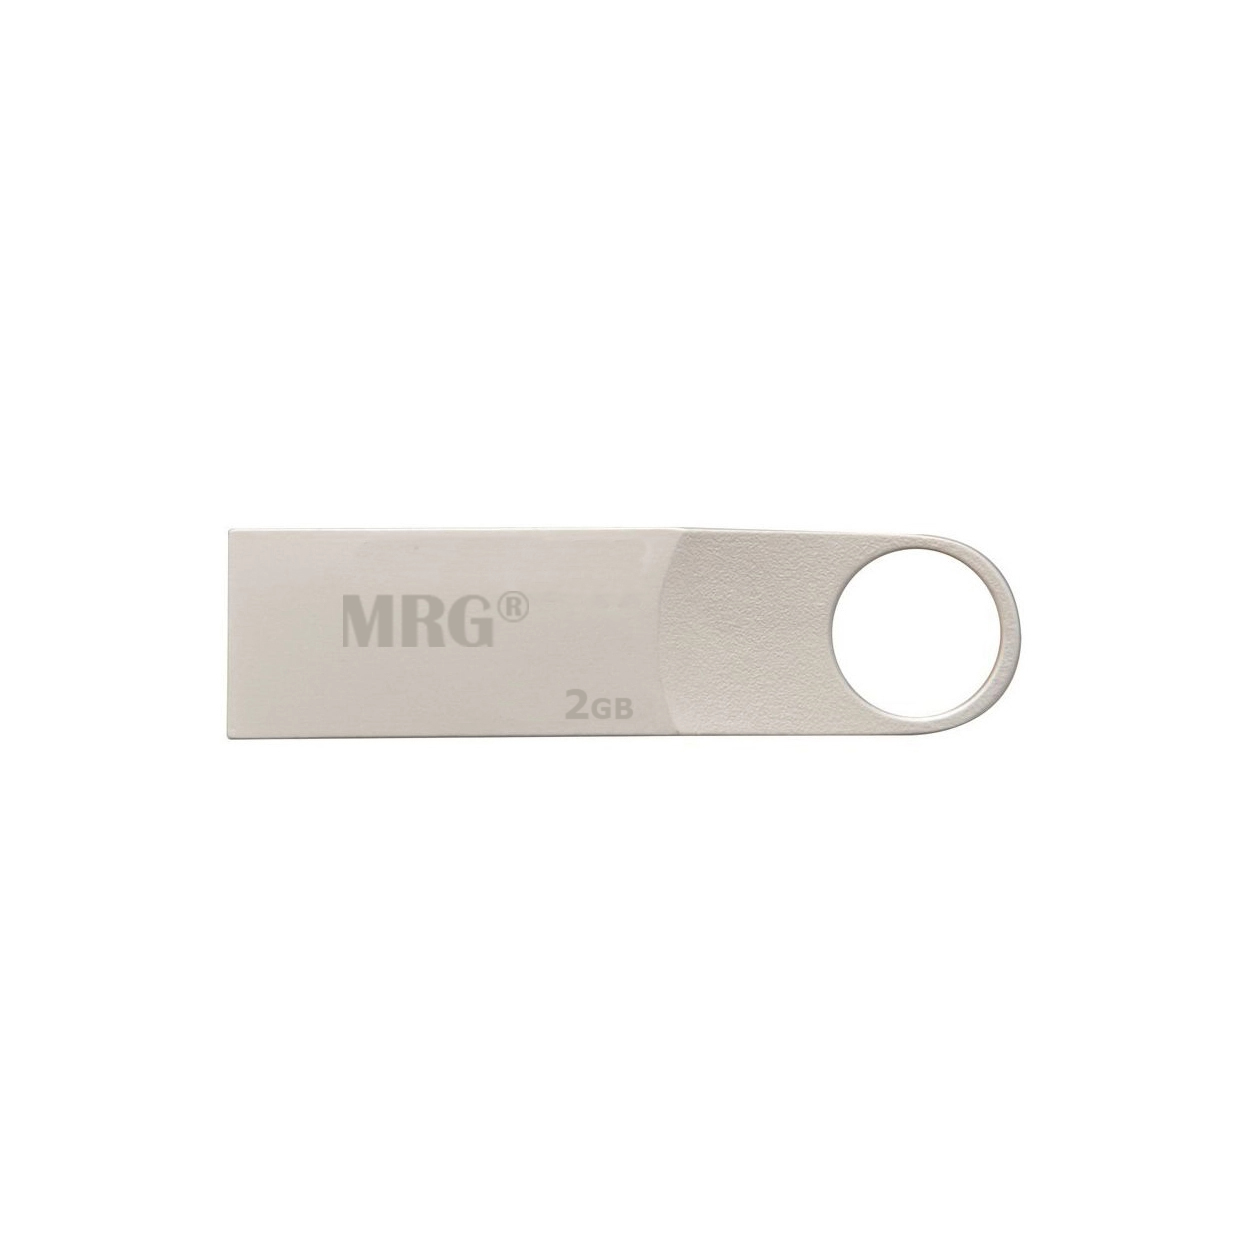 Memorie USB MRG M-SE9, USB 2.0, 2 GB, Gri